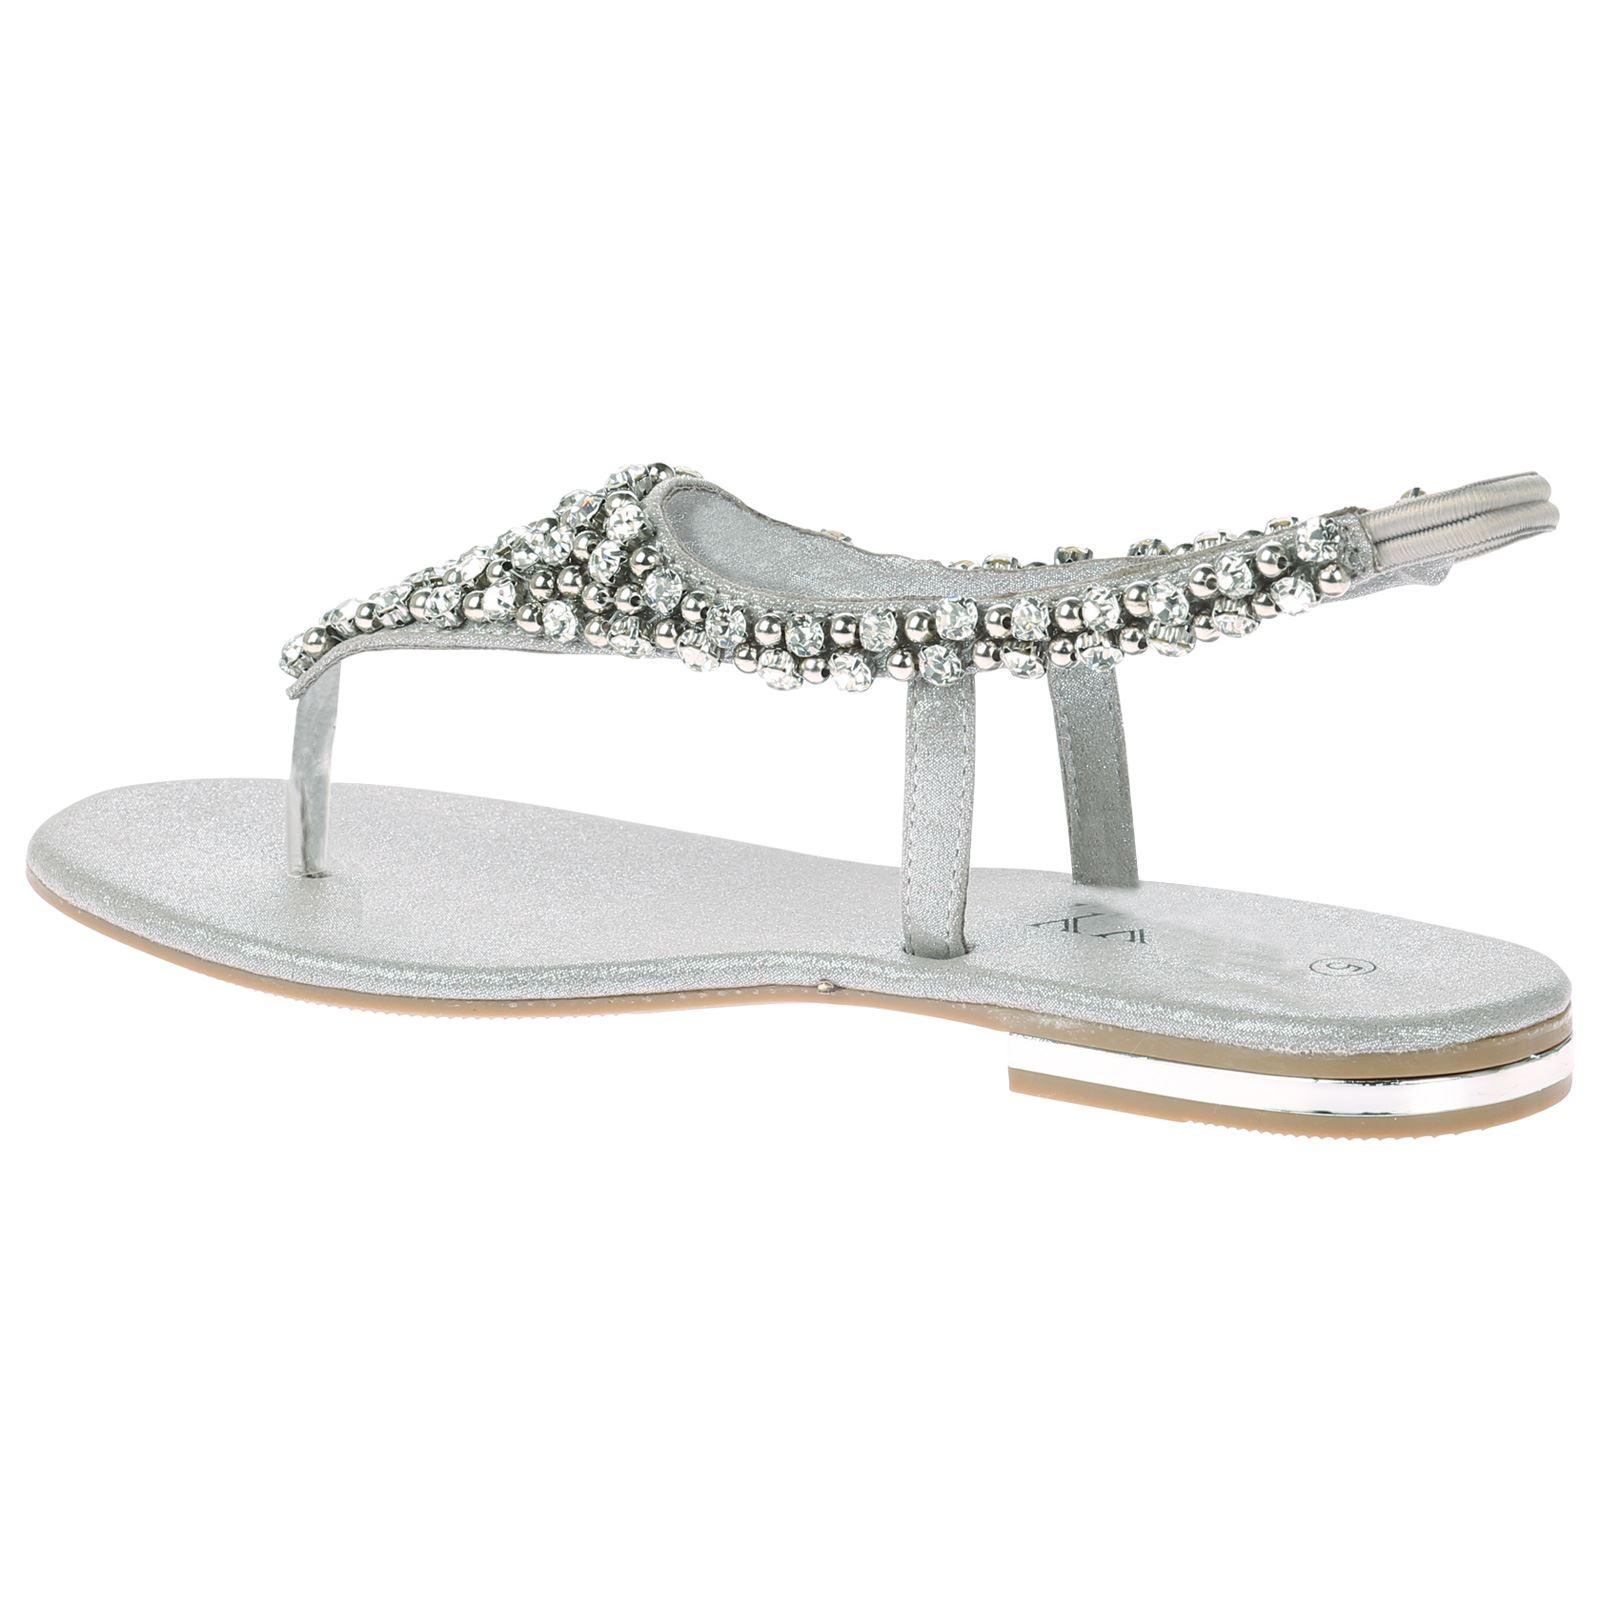 Linda Womens Flats Diamante Low Heels Evening Dress Formal Sandals Ladies Shoes | EBay